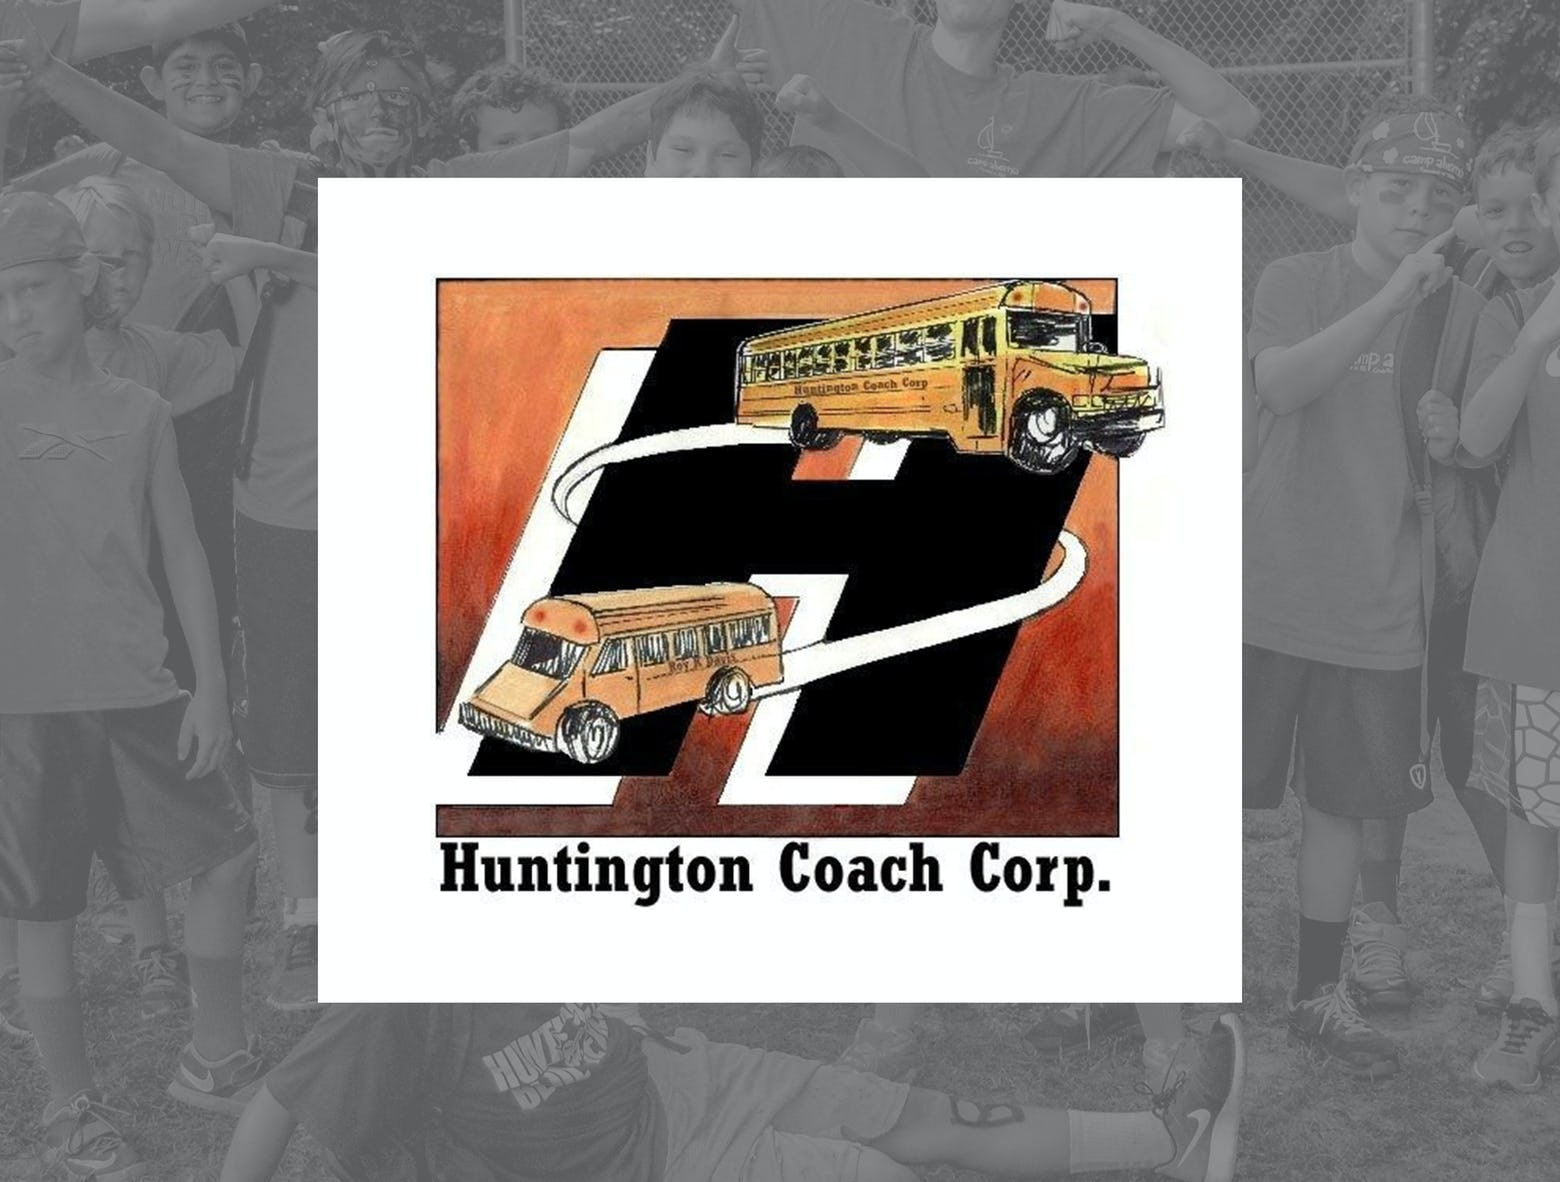 Huntington Coach